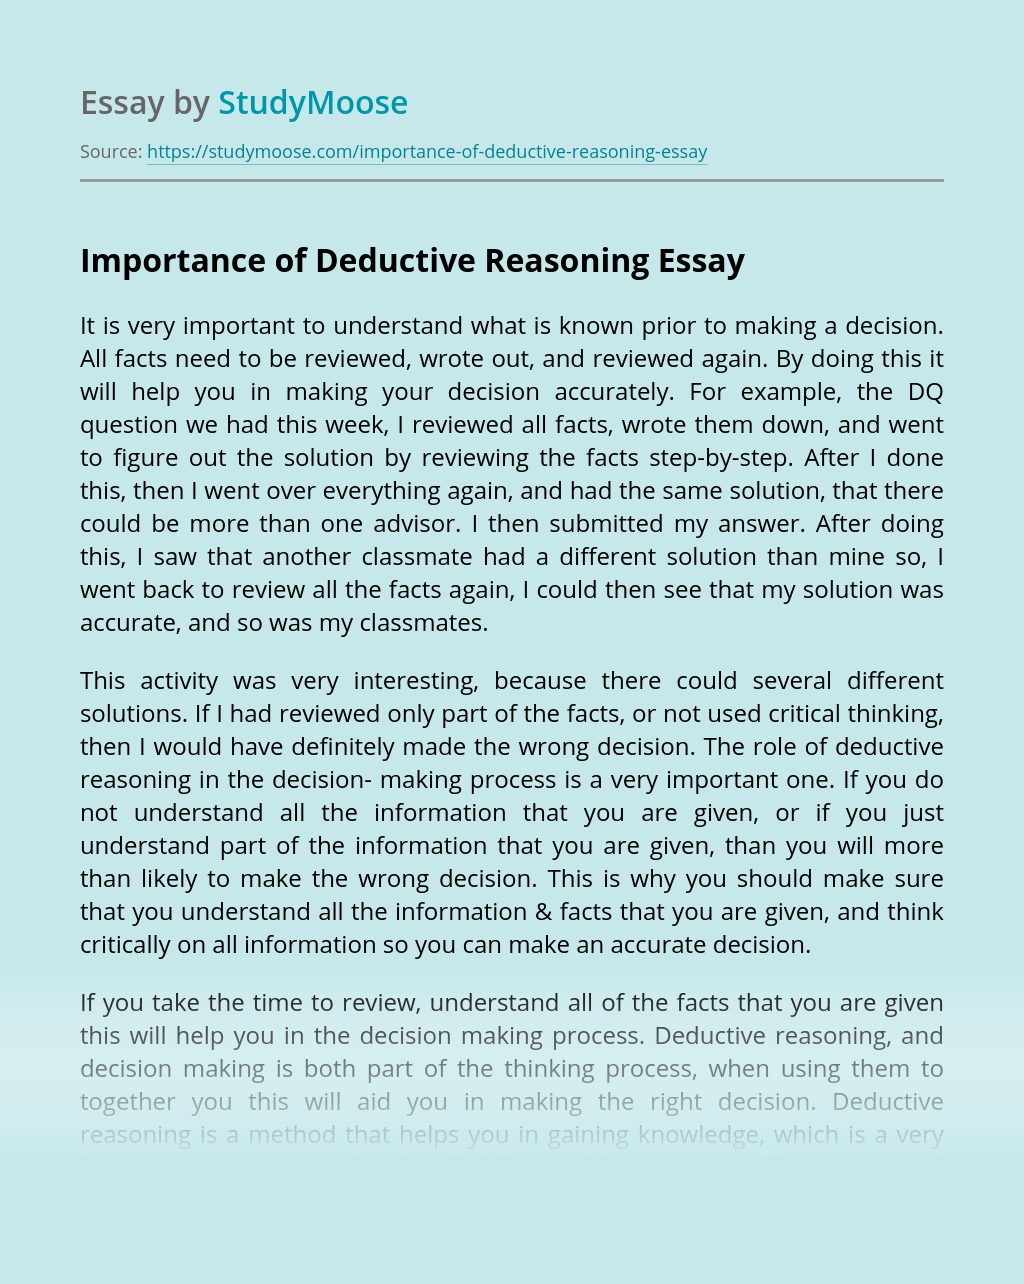 Importance of Deductive Reasoning